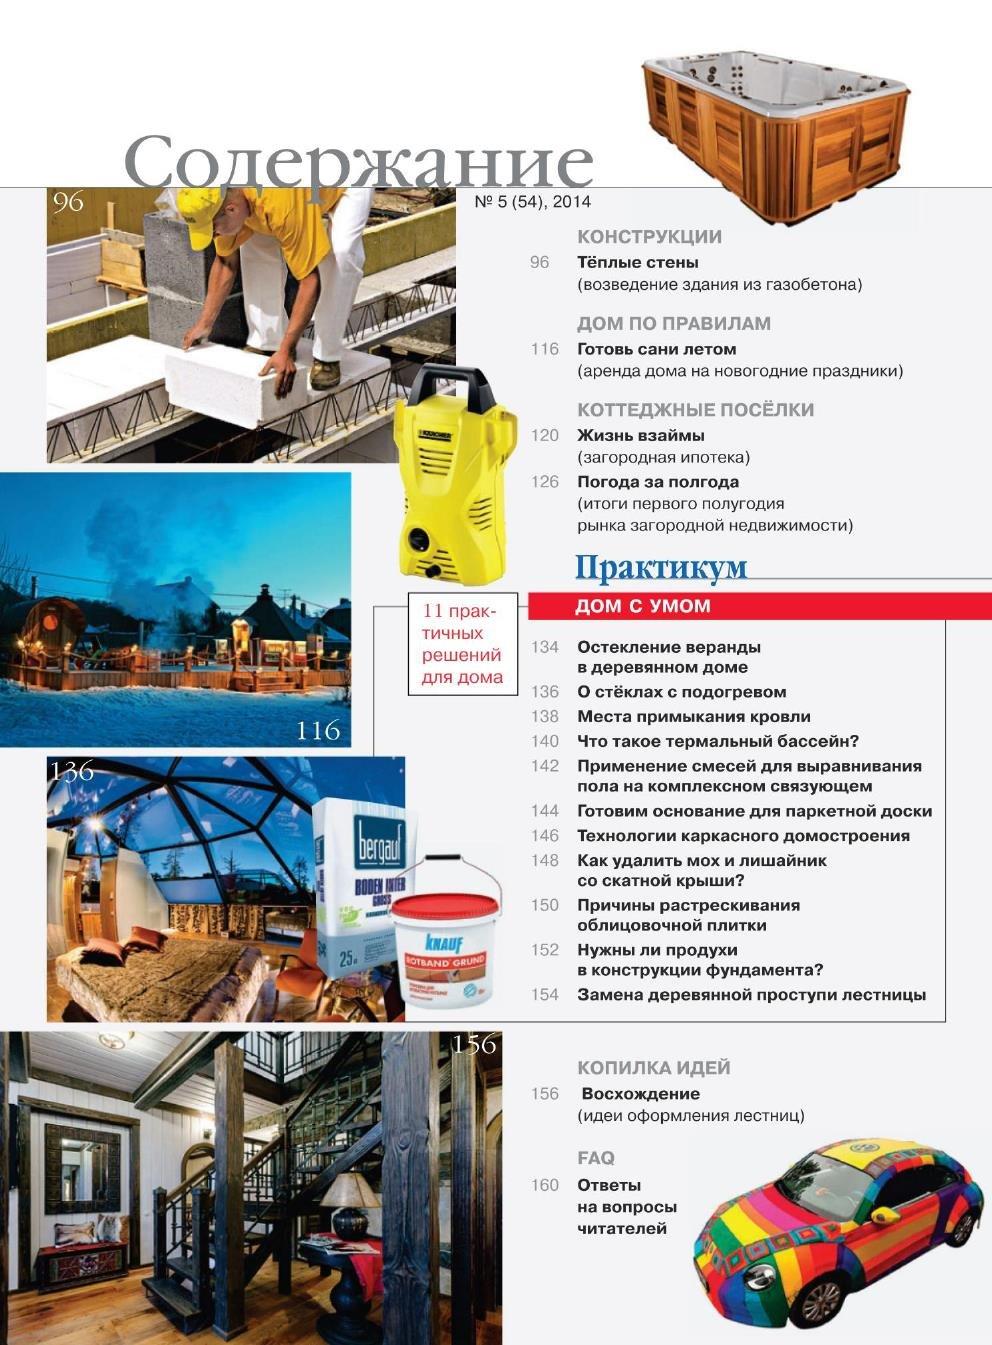 http://images.vfl.ru/ii/1409163821/5e23da4b/6146519.png